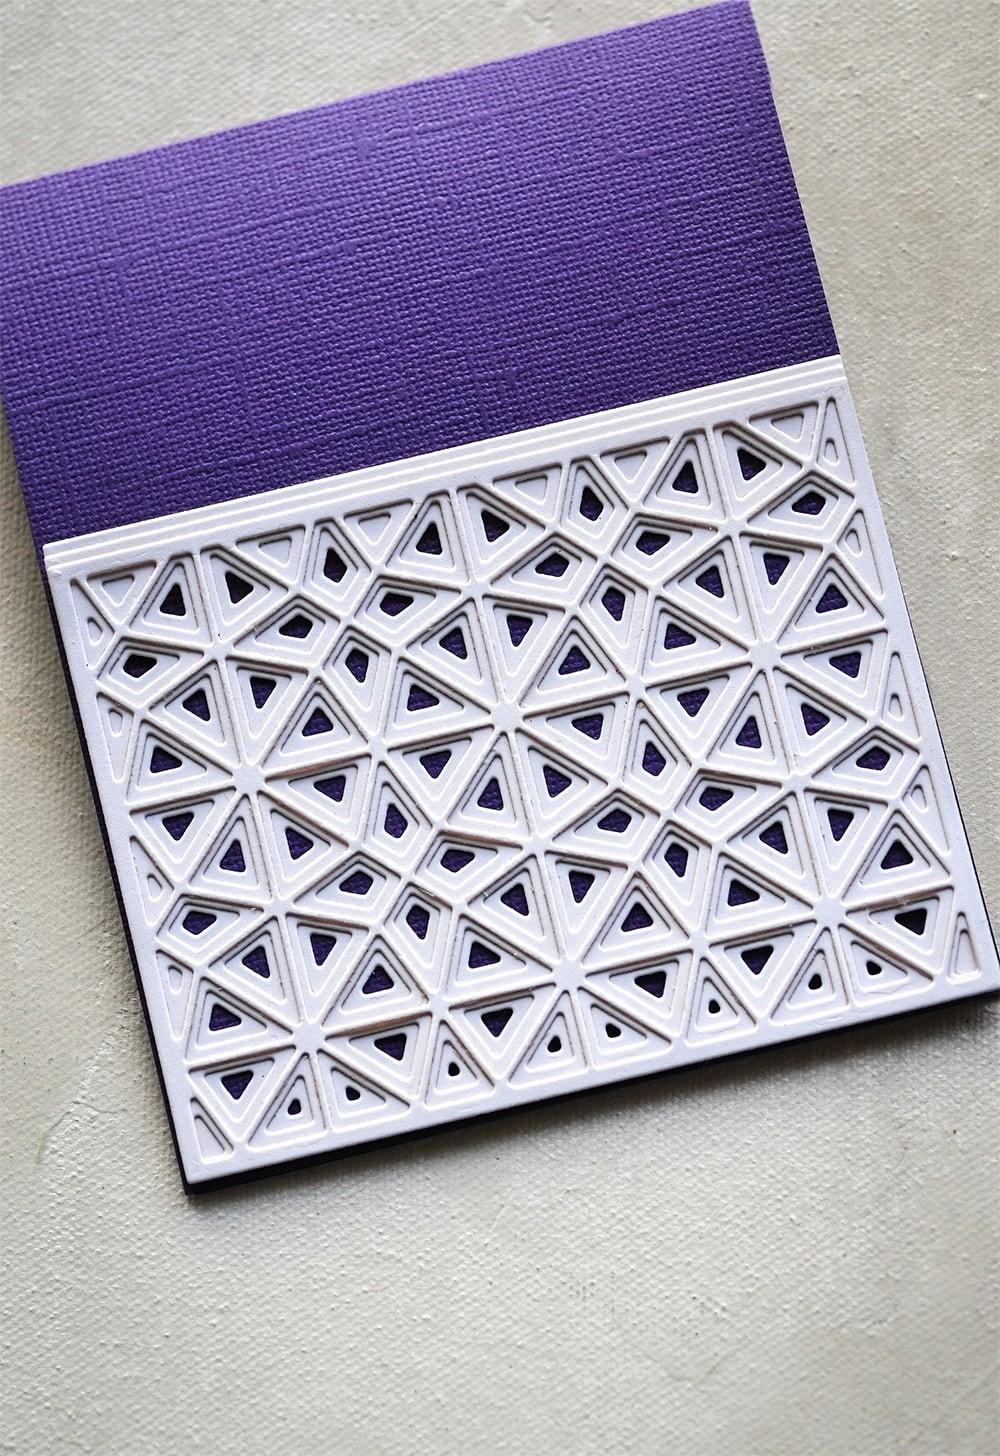 Birch Press Splendor Bevel Plate Layer Set 56111